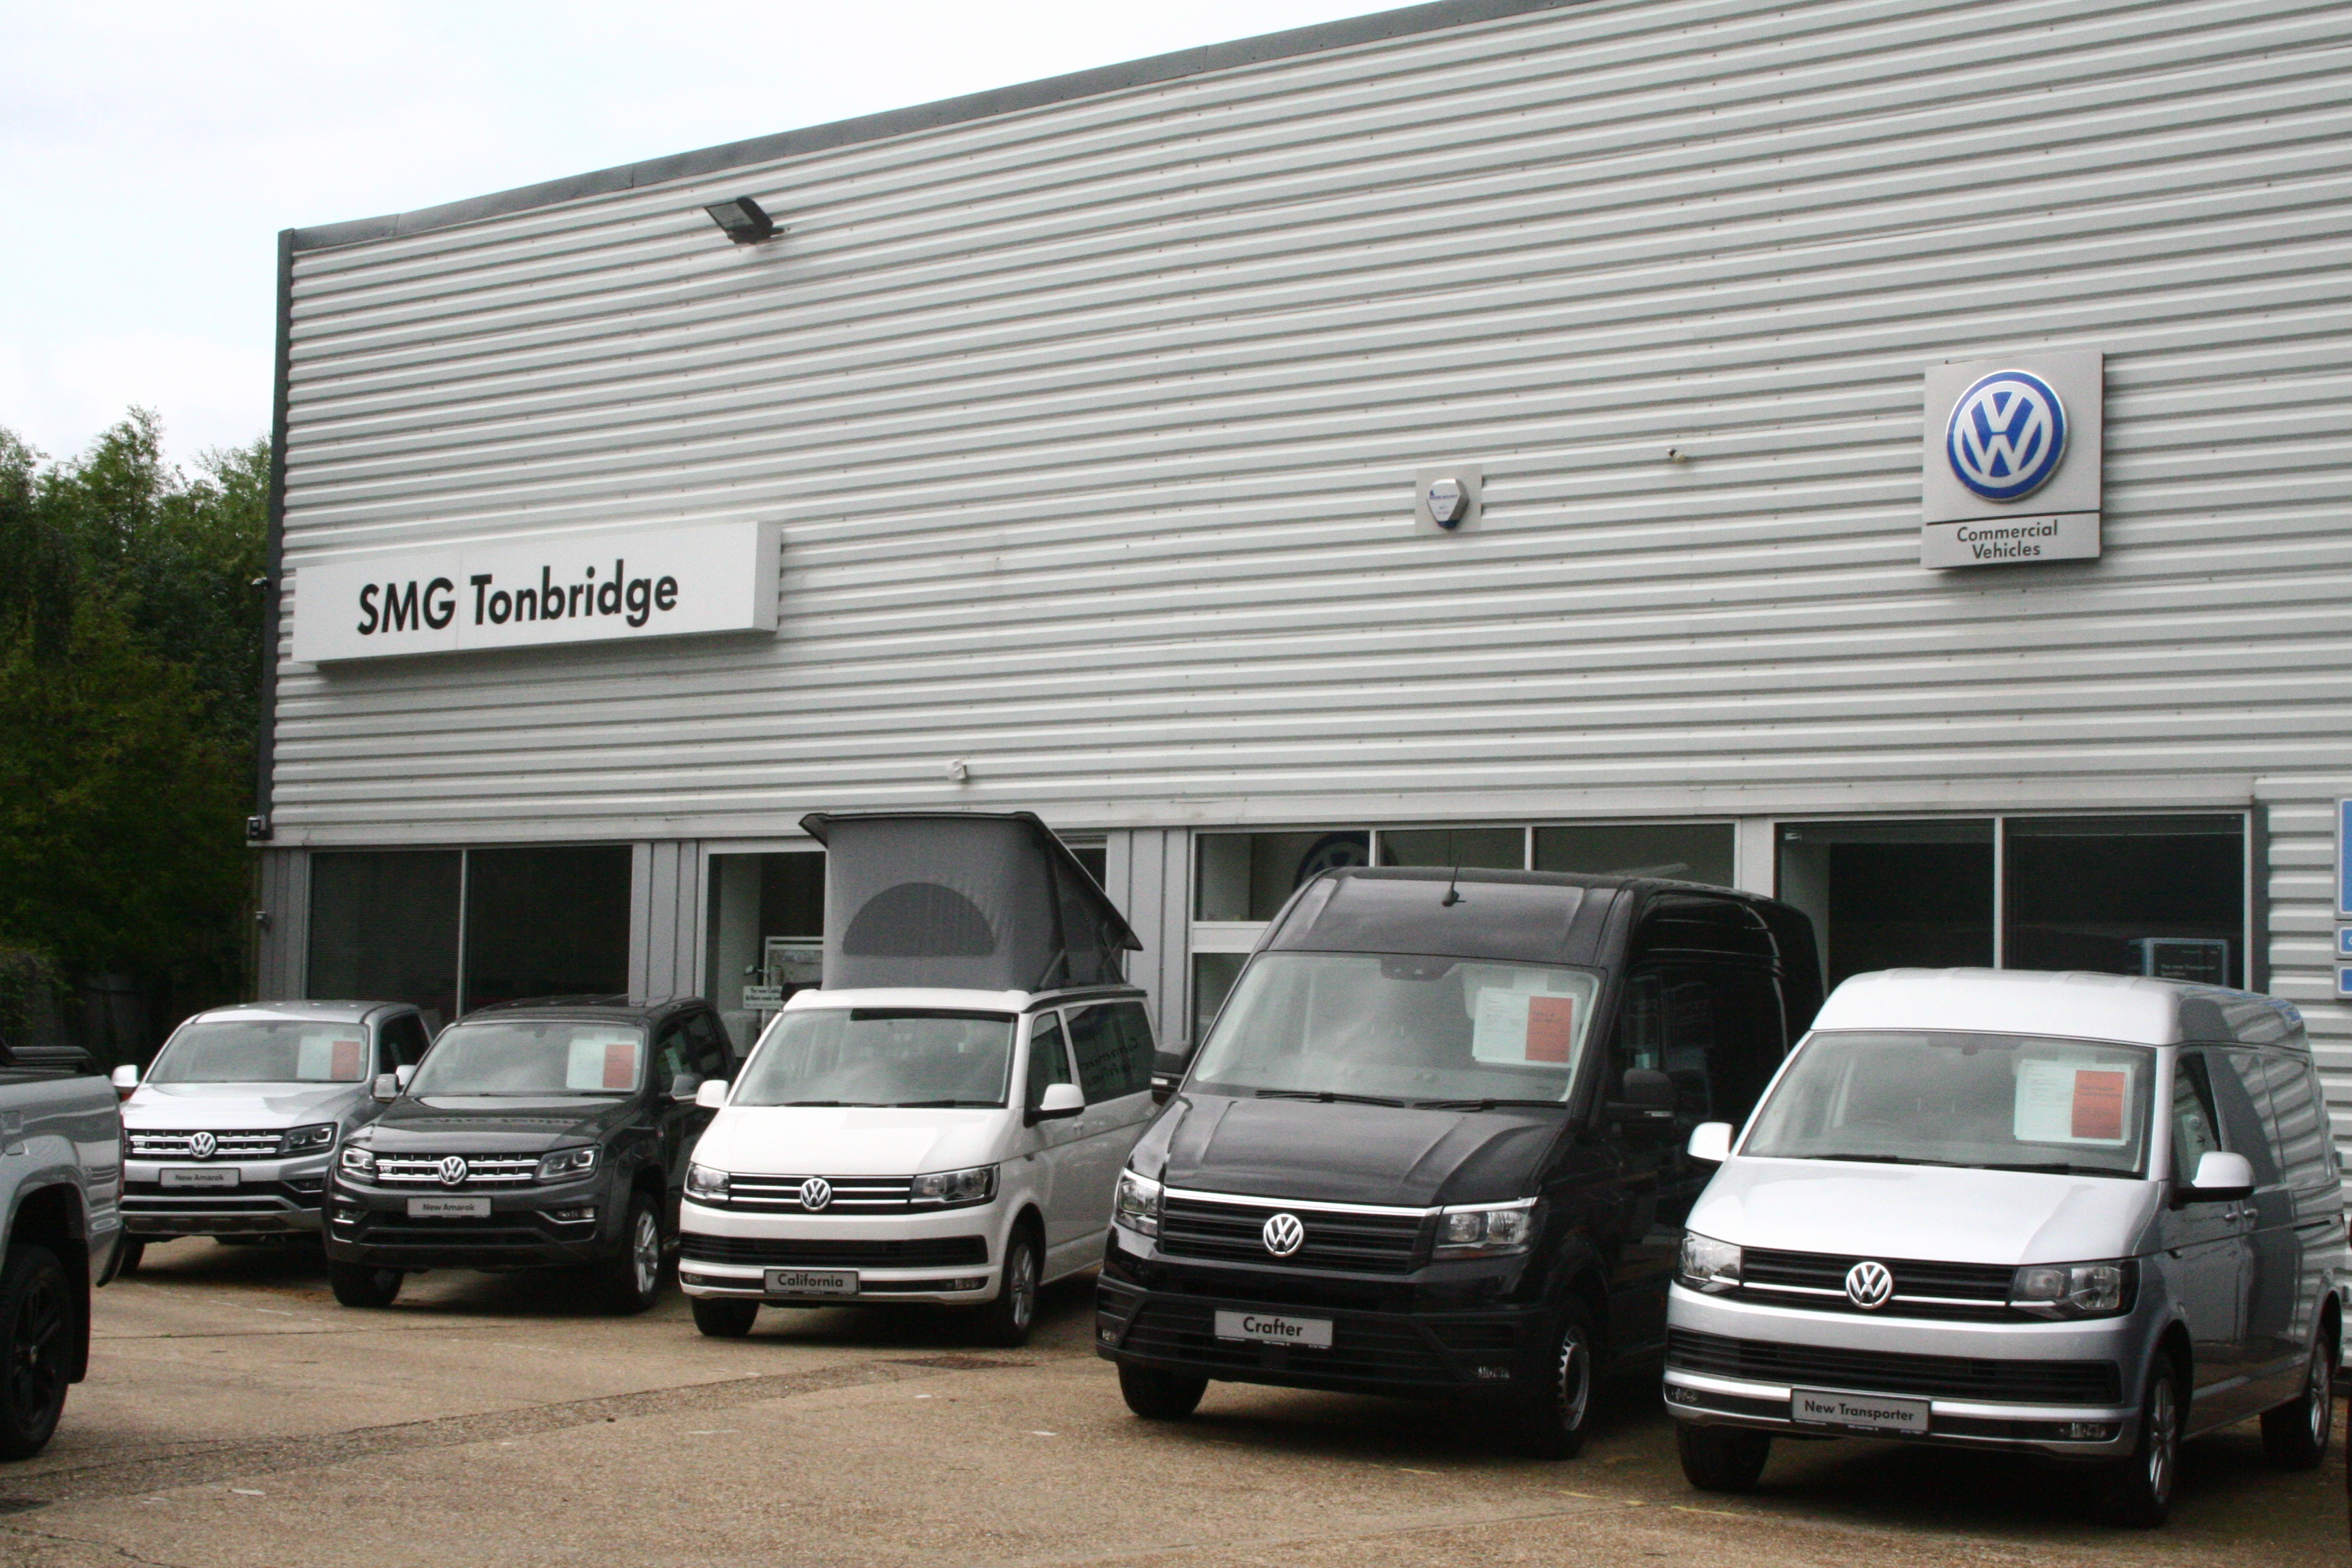 SMG Tonbridge VW